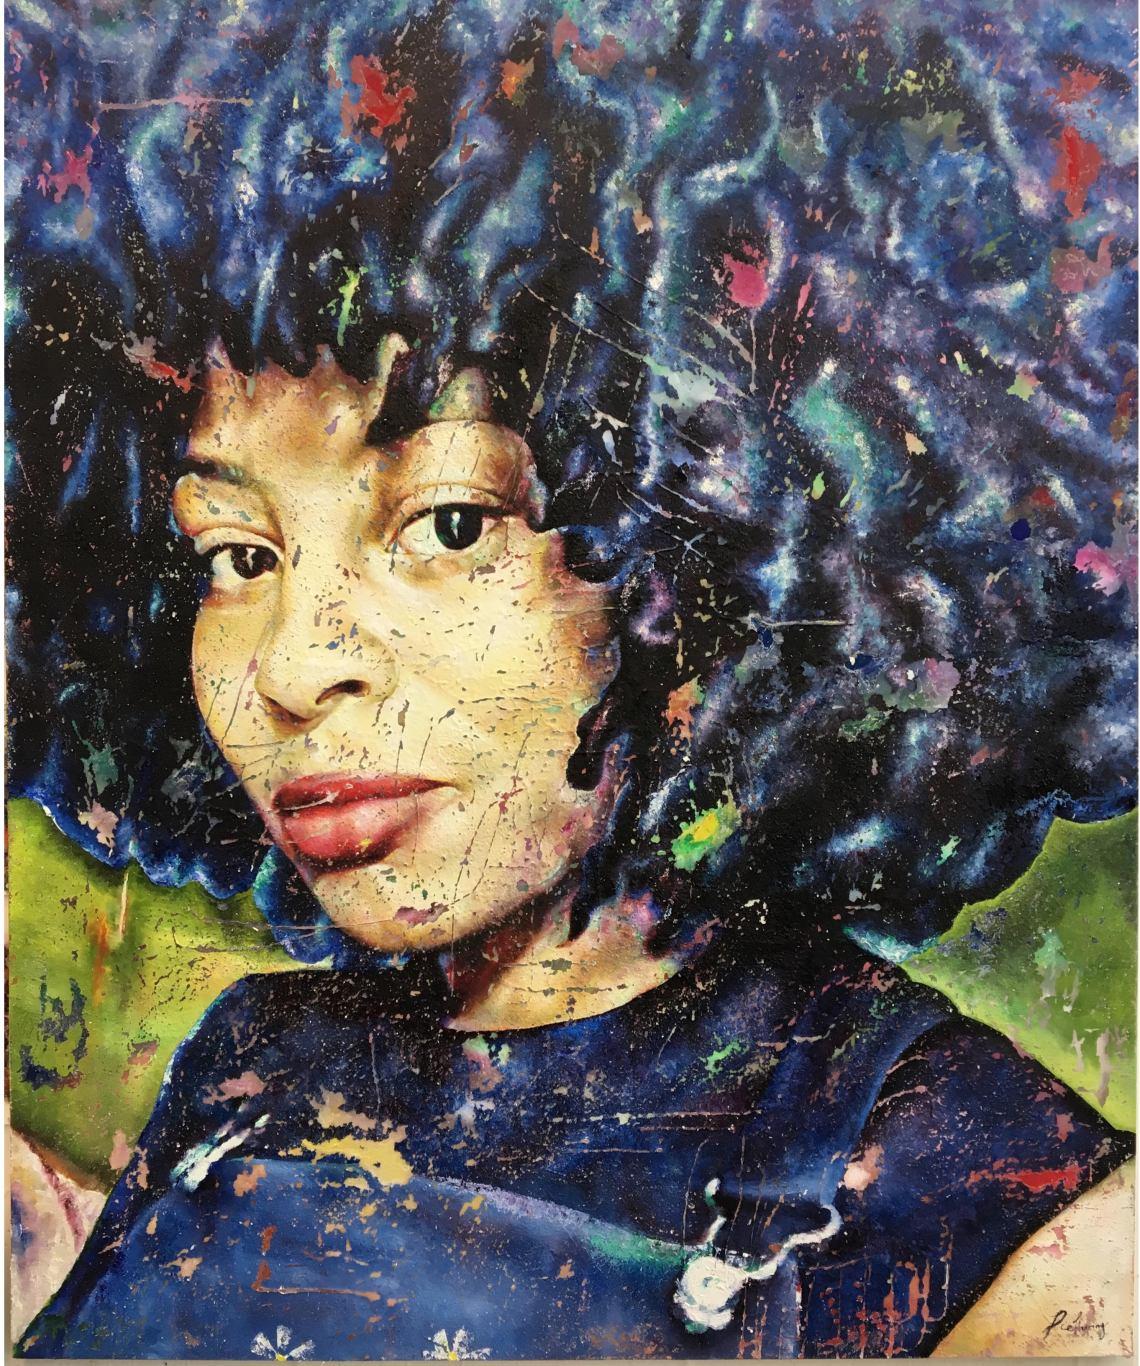 Emily Herring - Joyce - 2017 - Oil and wax on canvas - 183x152cm